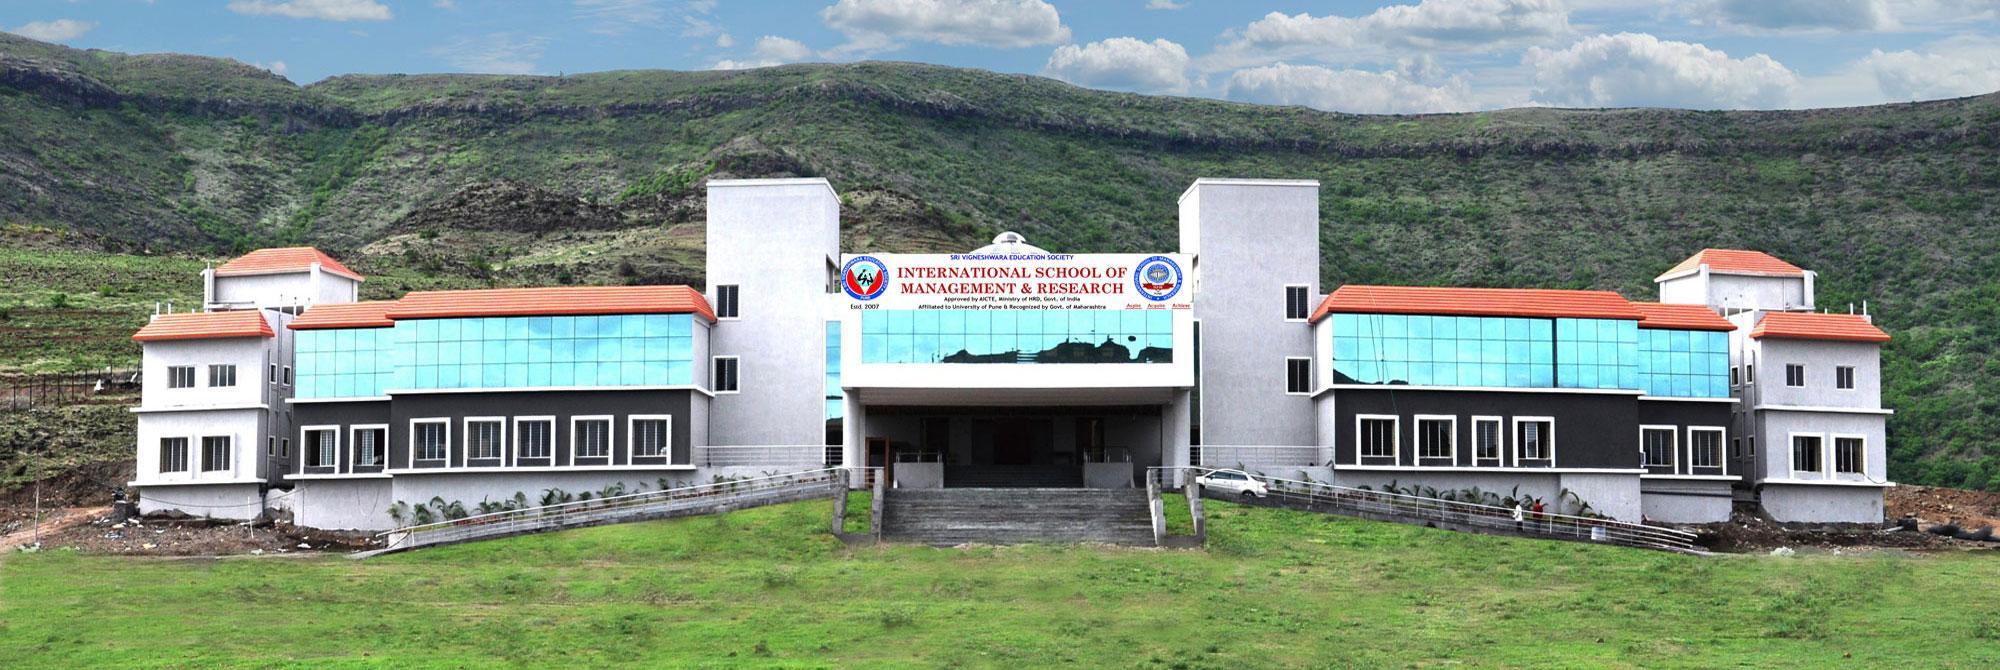 ISMR Pune Admission 2020